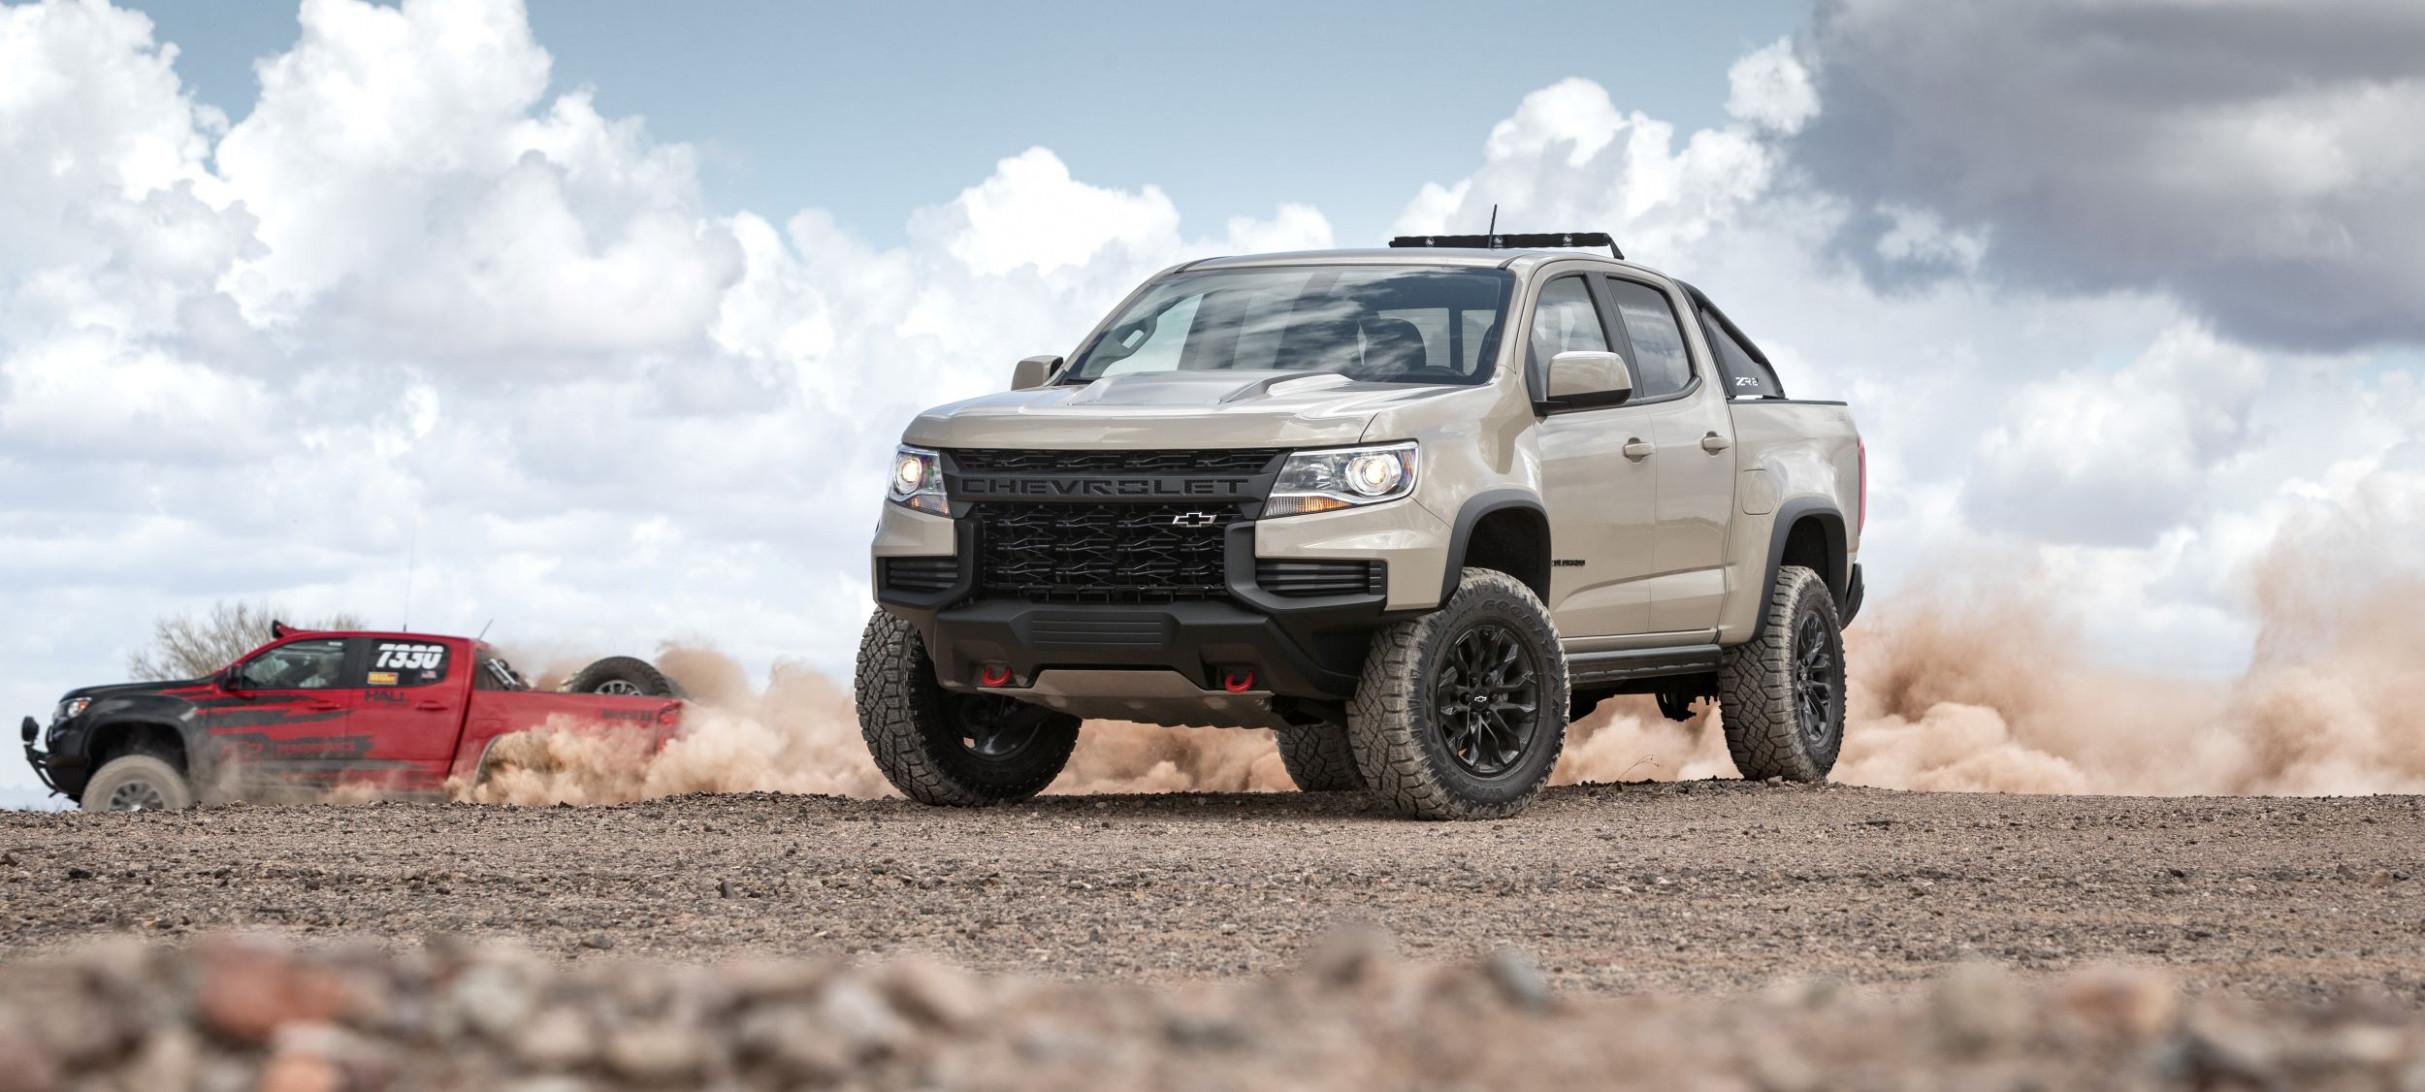 Redesign 2022 Chevrolet Colorado Z72